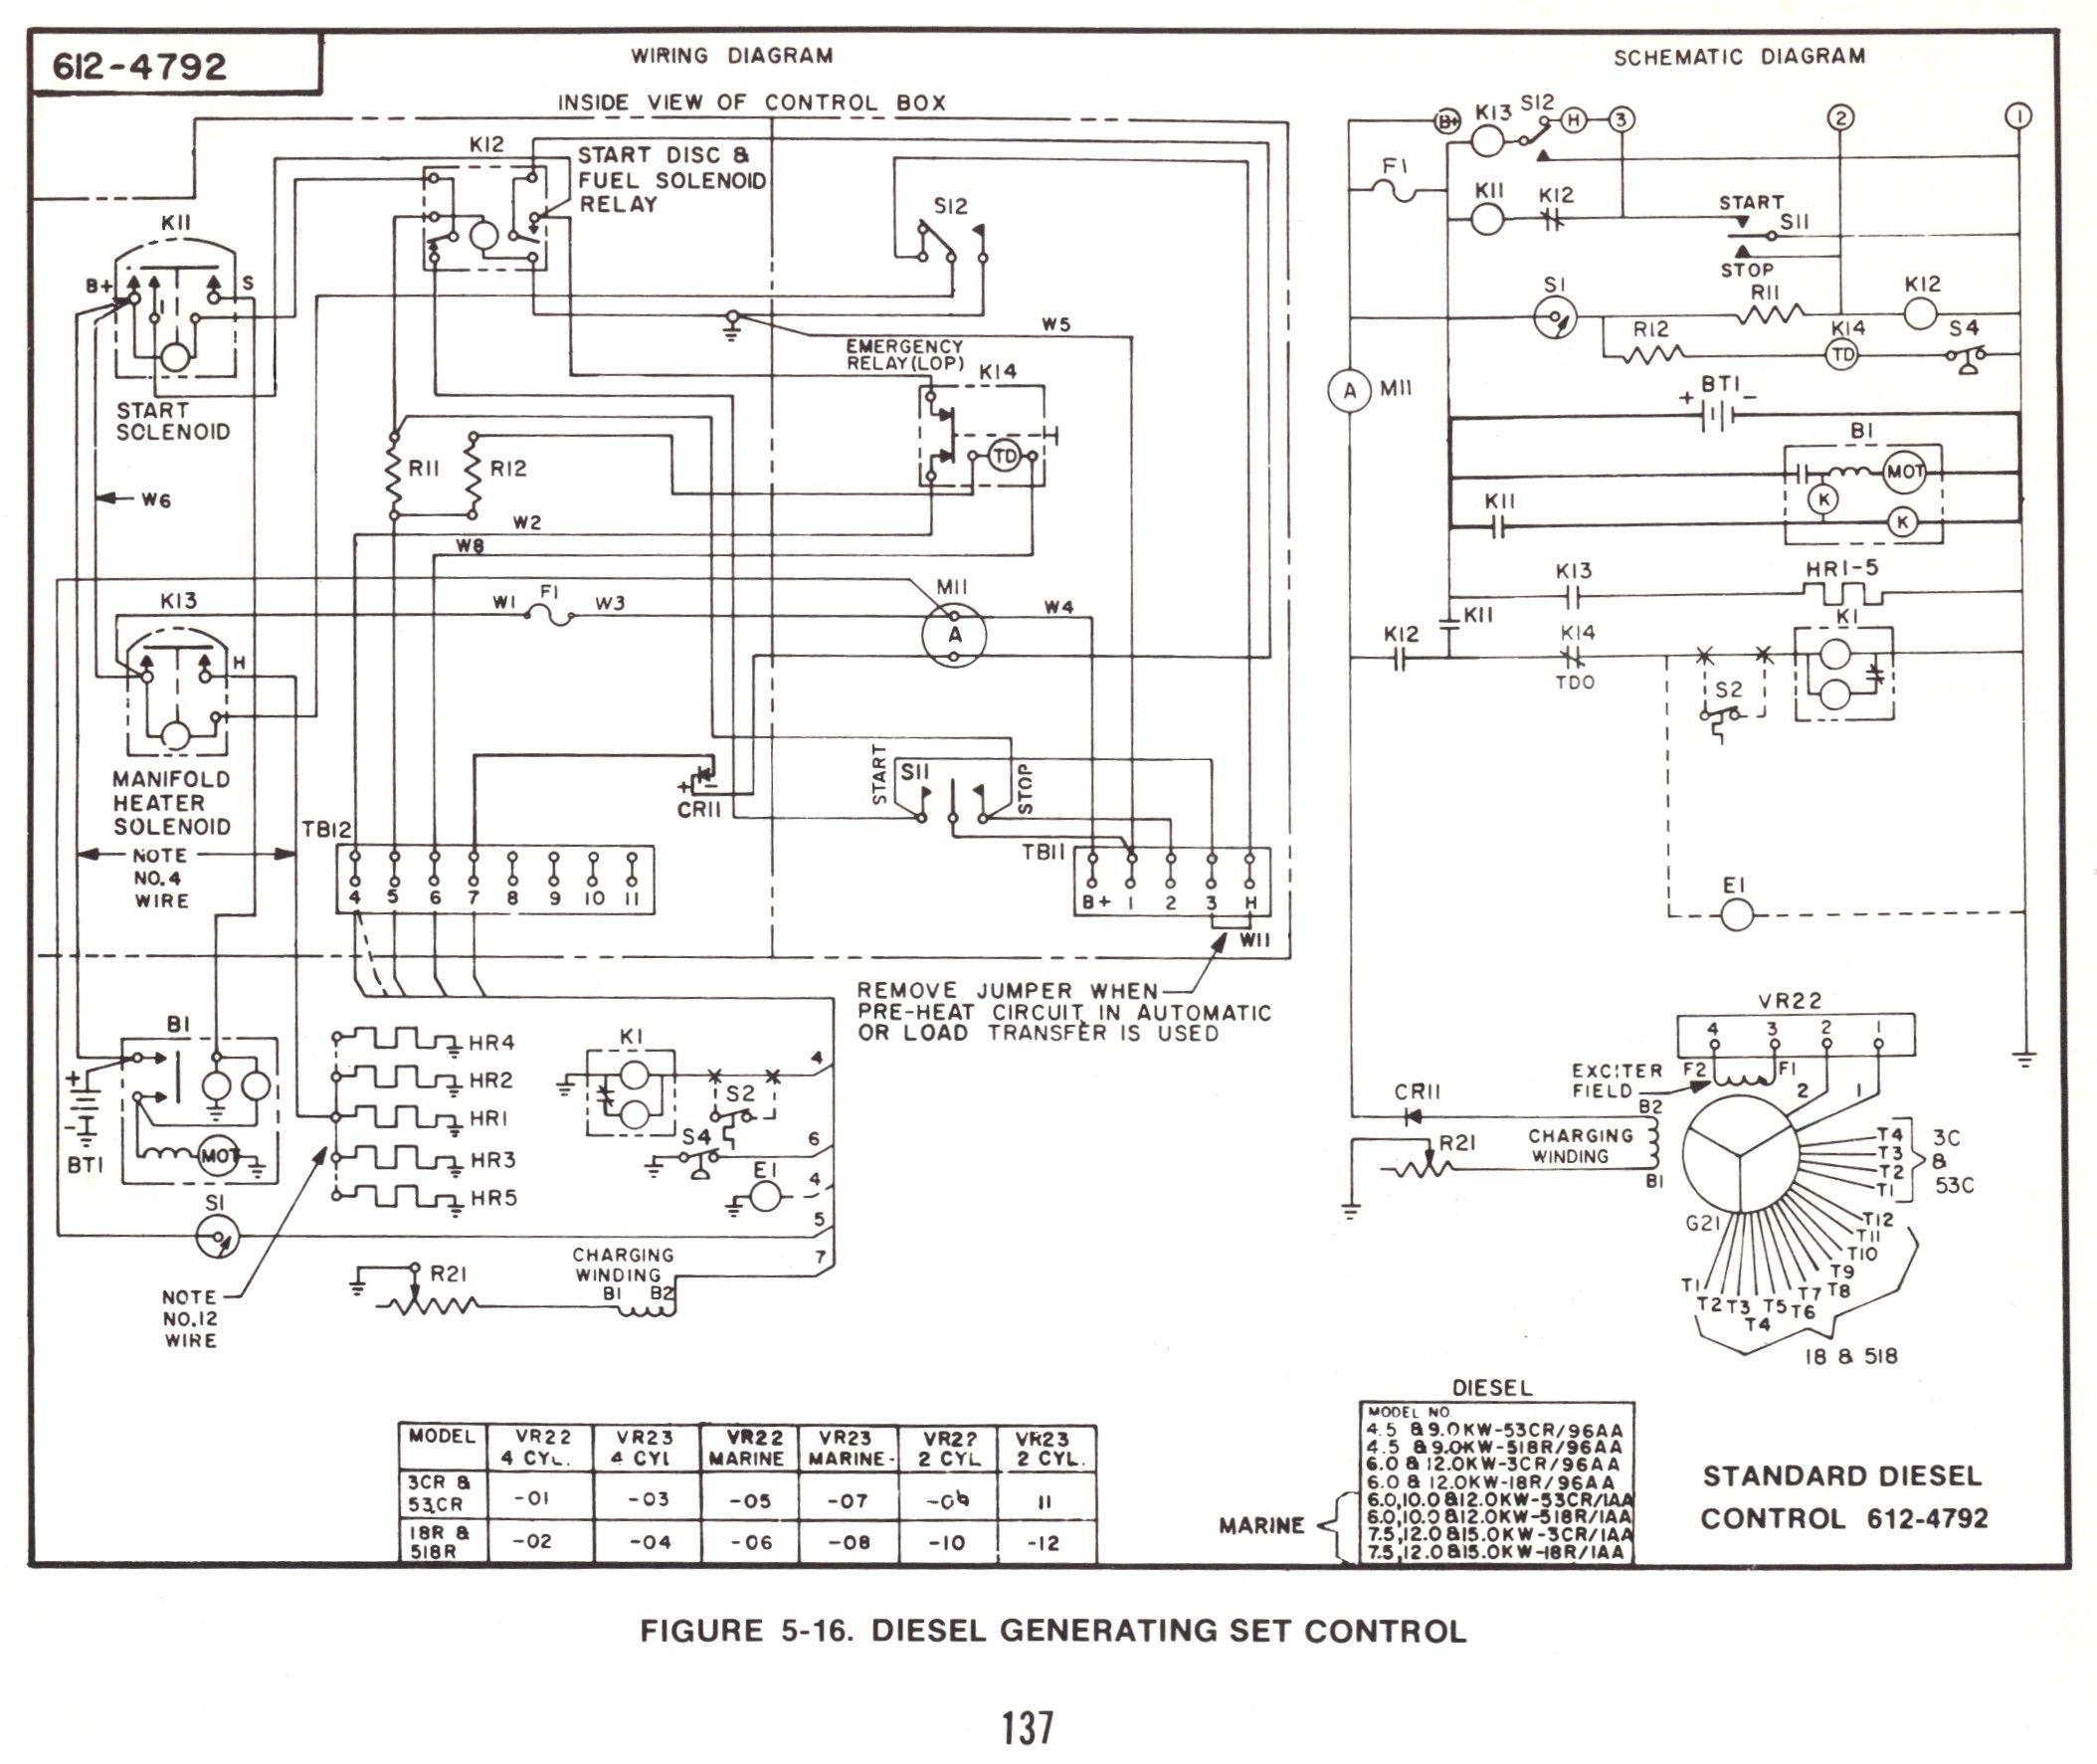 Onan Generator Wiring Diagram Awesome In 2020 Diagram Generation Wire